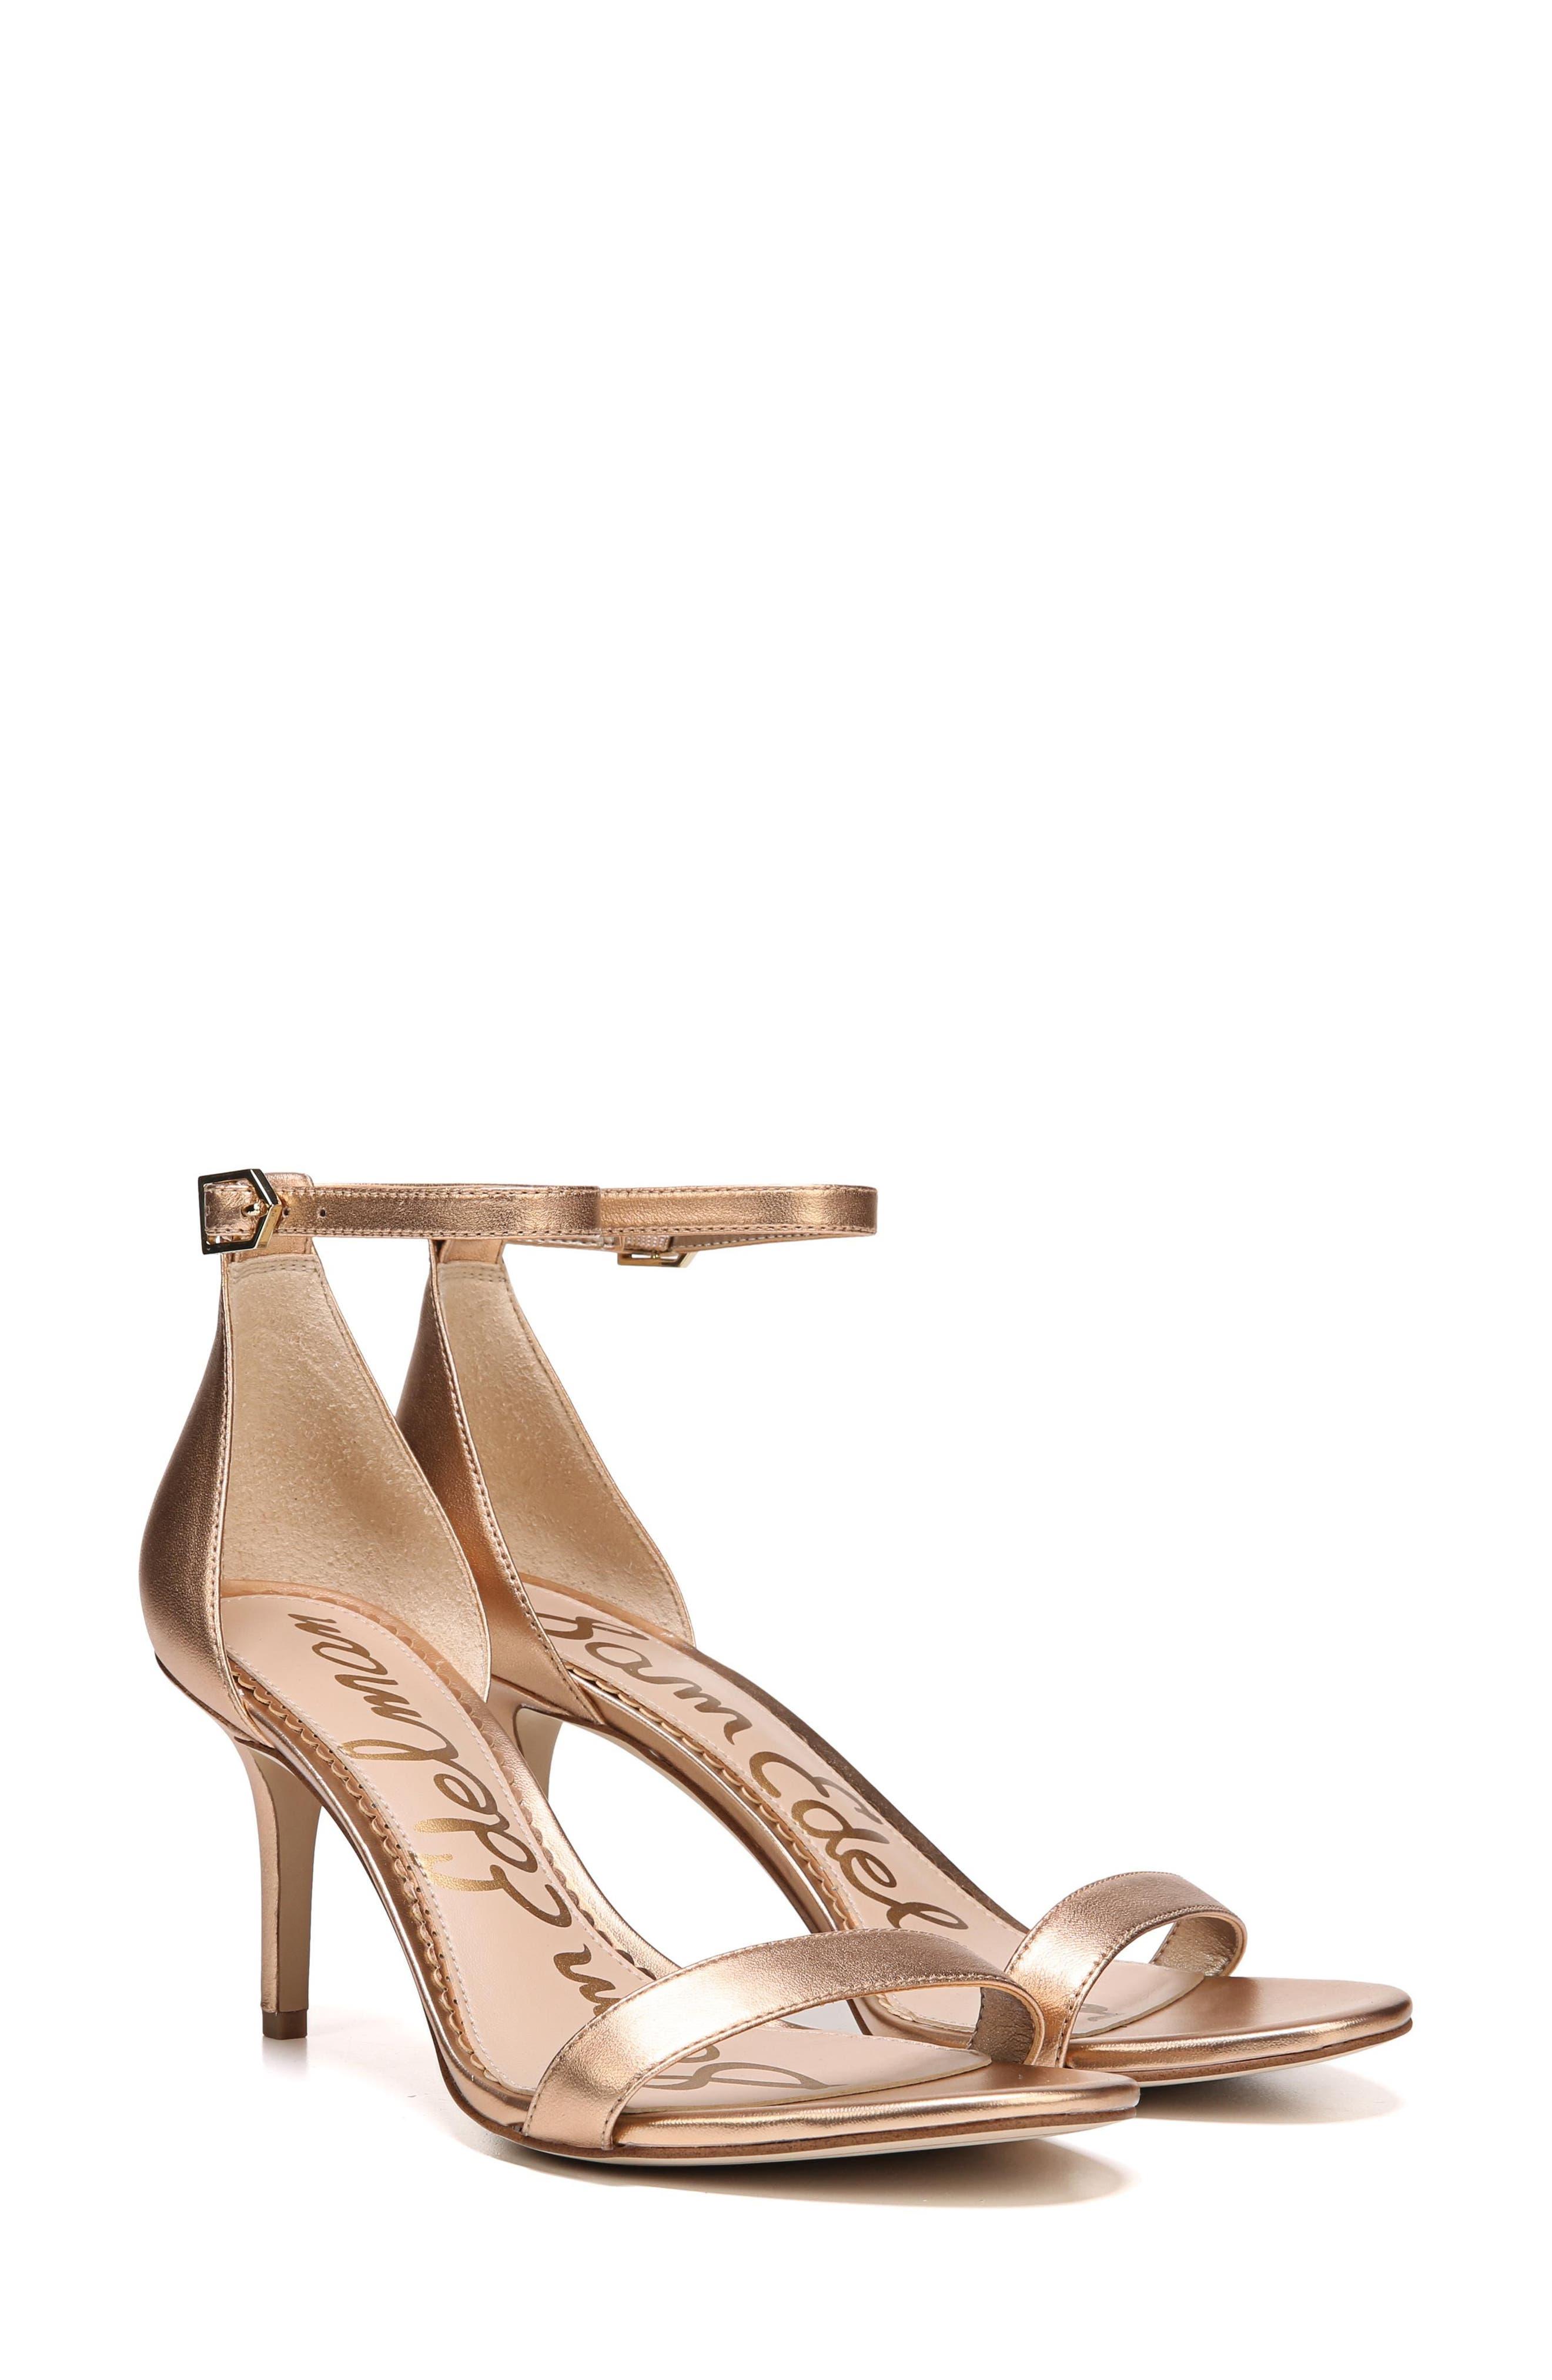 ,                             'Patti' Ankle Strap Sandal,                             Alternate thumbnail 78, color,                             221